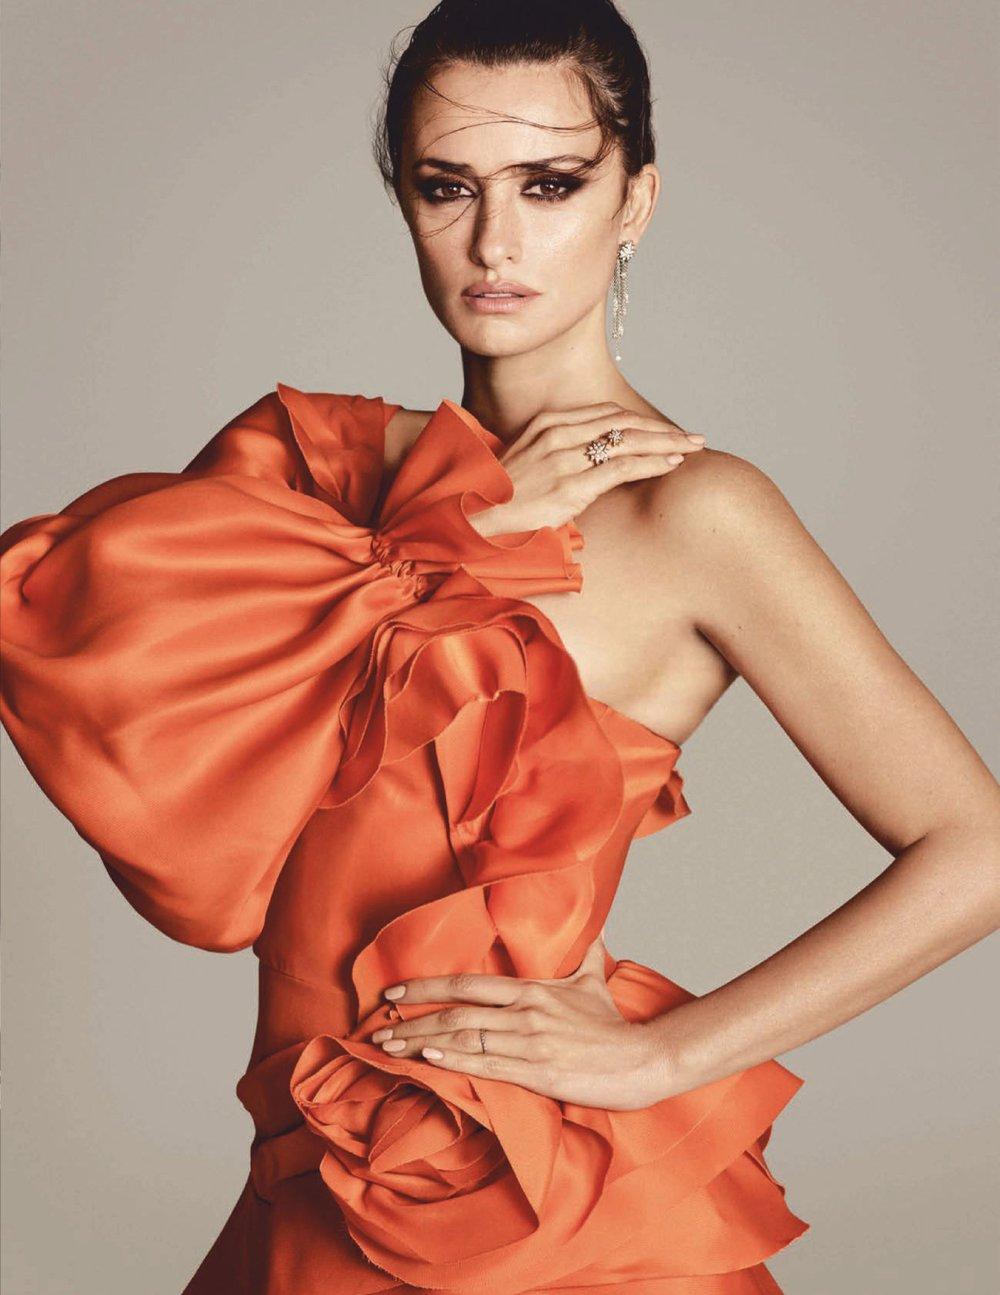 Penelope-Cruz-Luigi-Iango-Vogue-Spain-April-2019- (7).jpg